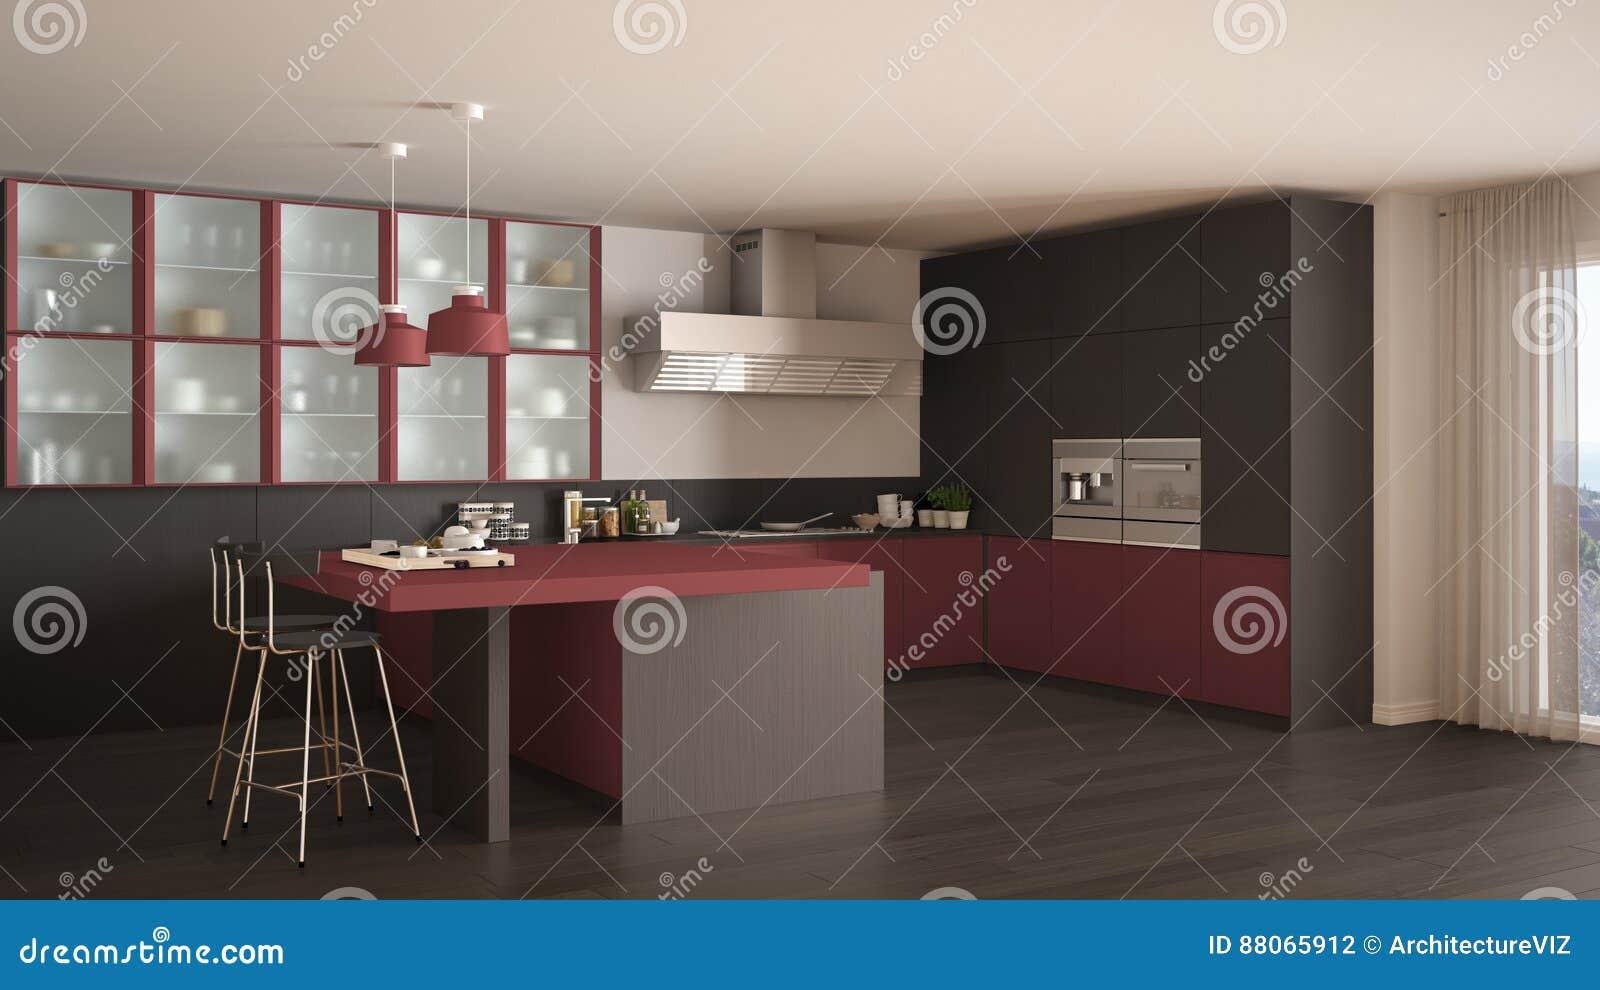 Klassieke minimale grijze en rode keuken met moderne parketvloer